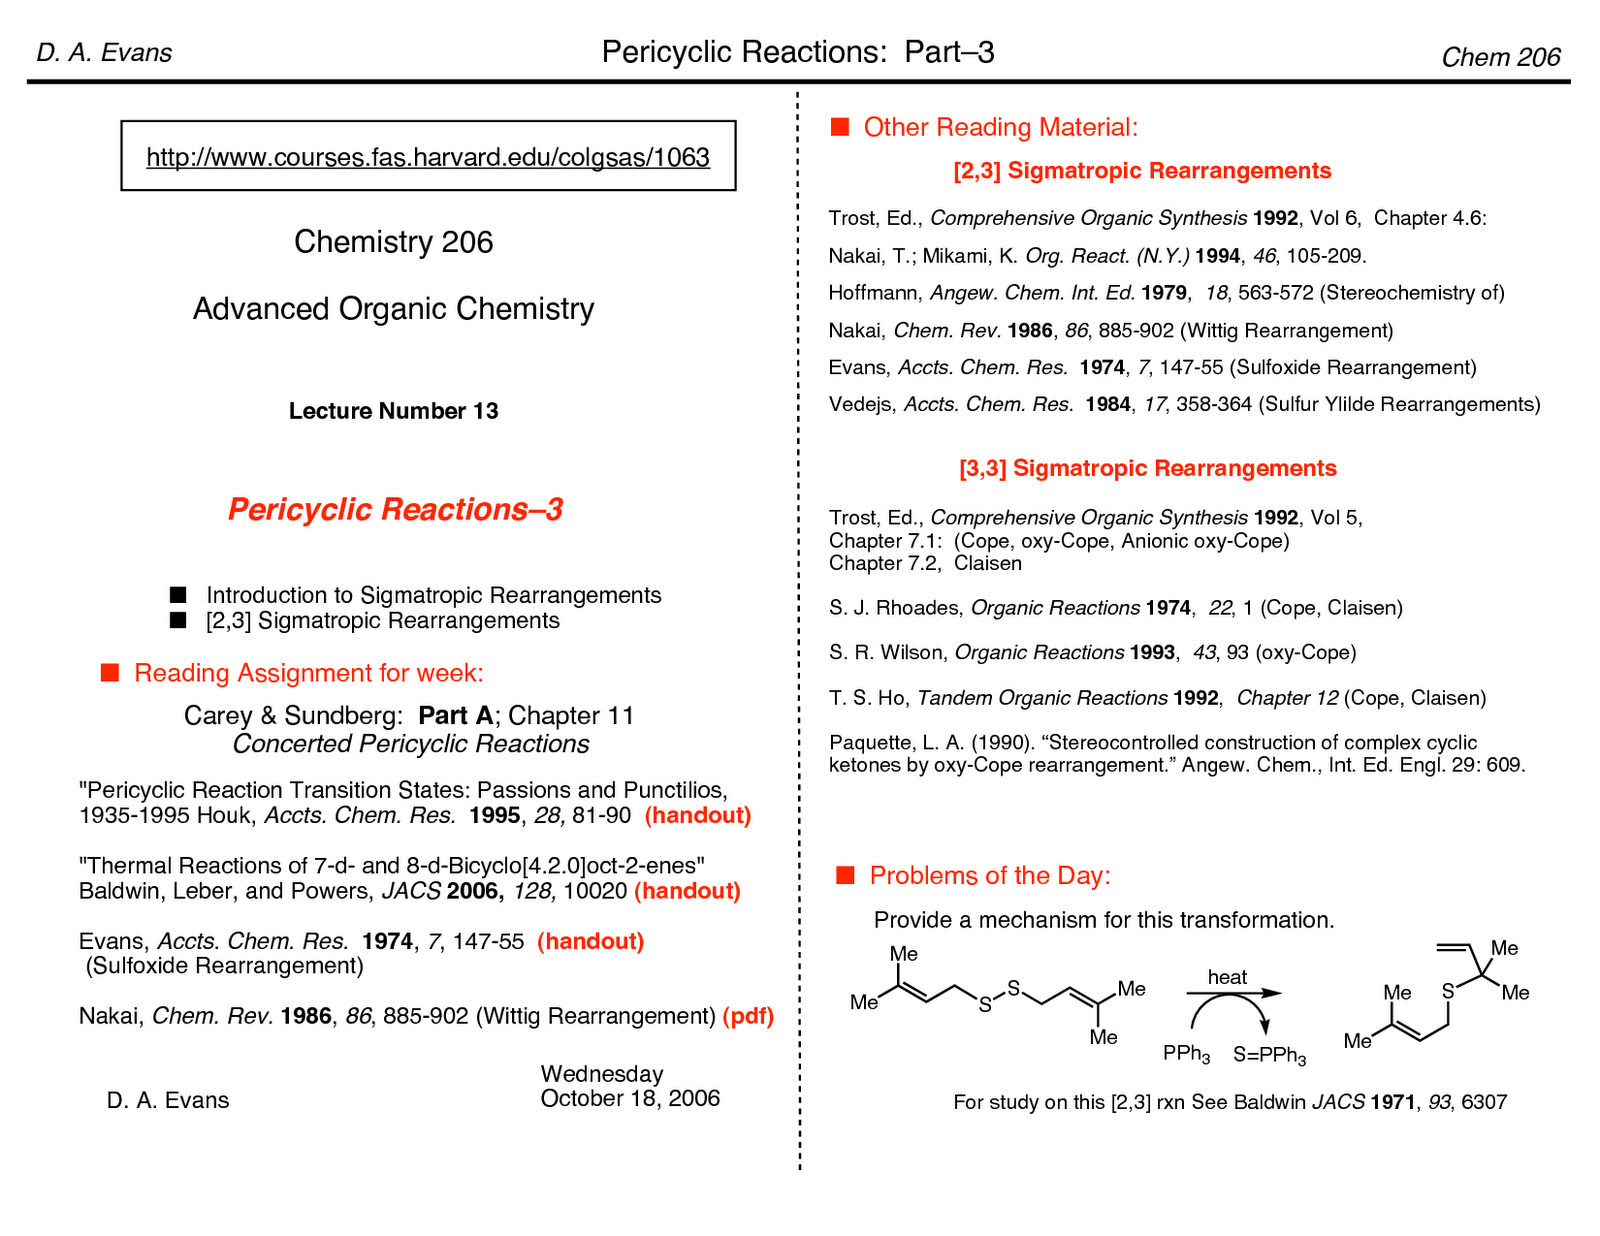 Organic chemistry 4ed - Solomons.pdf. Organic chemistry 5ed - Carey -  html.rar. Organic Chemistry by JHOSPH.djvu